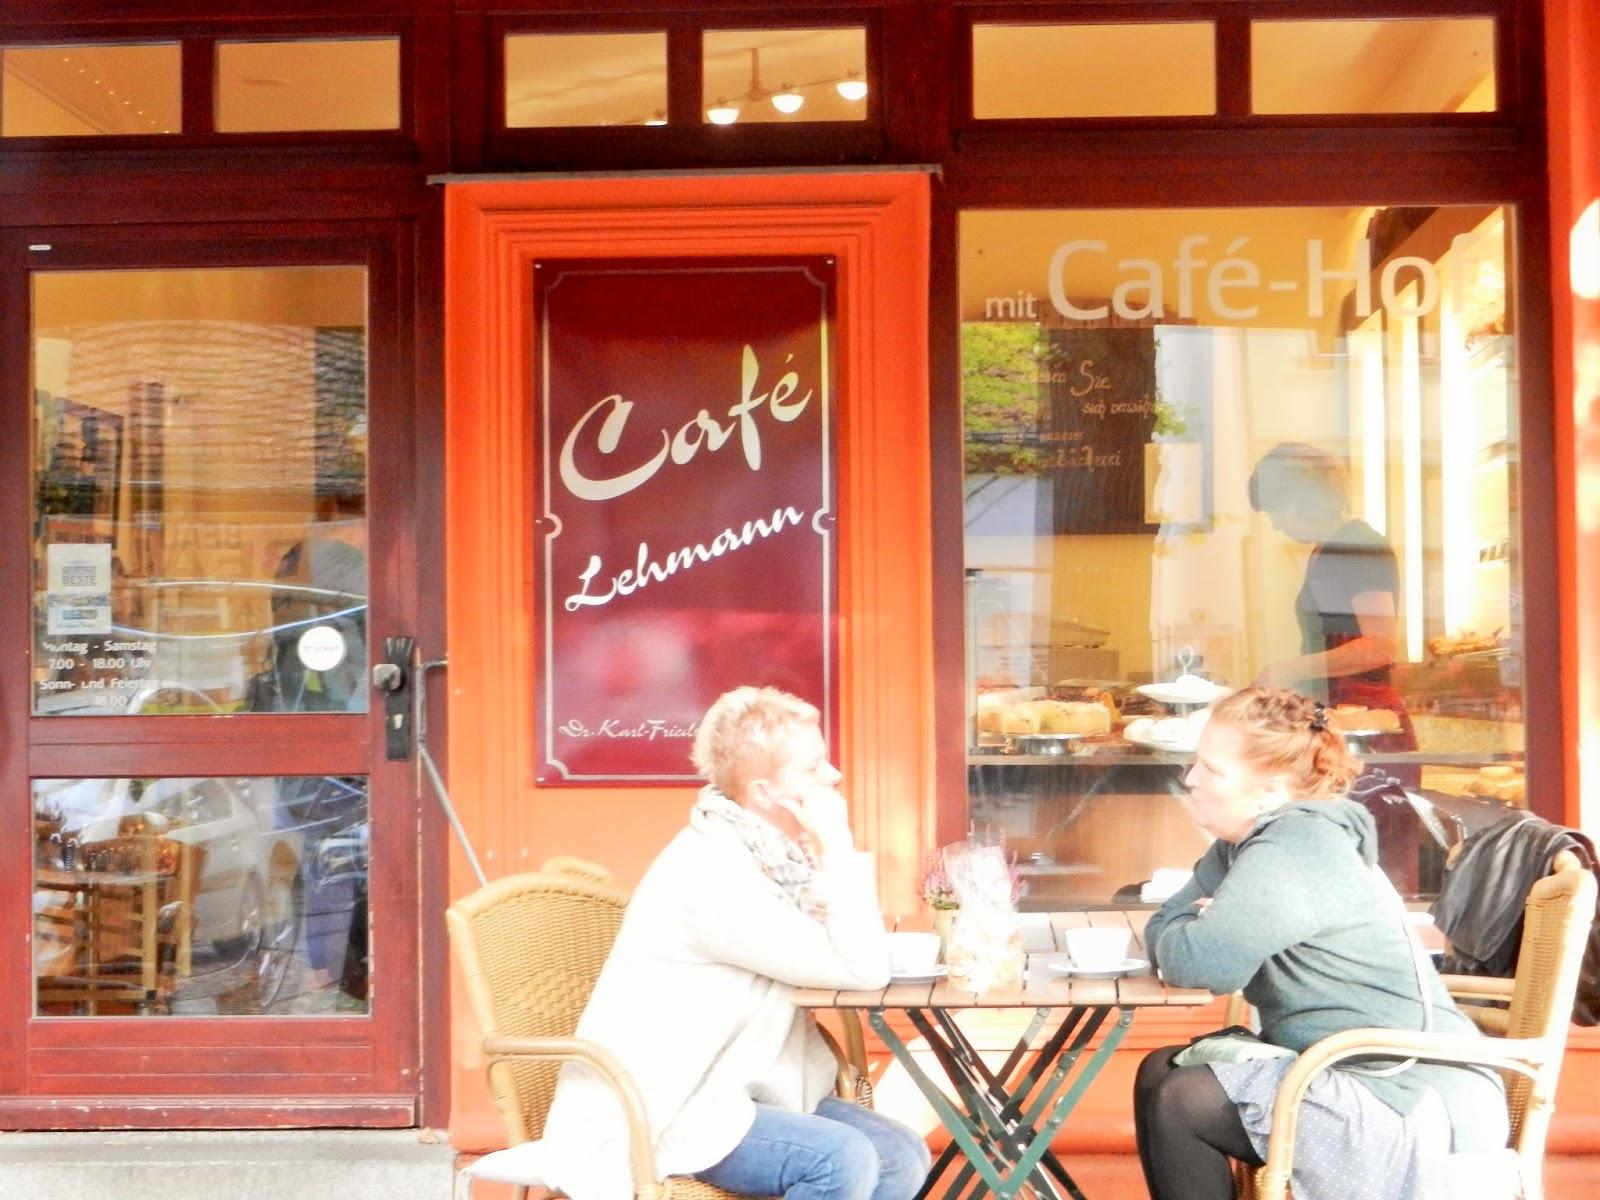 mademoiselle louve: café lehmann, friedrichshagen, berlin